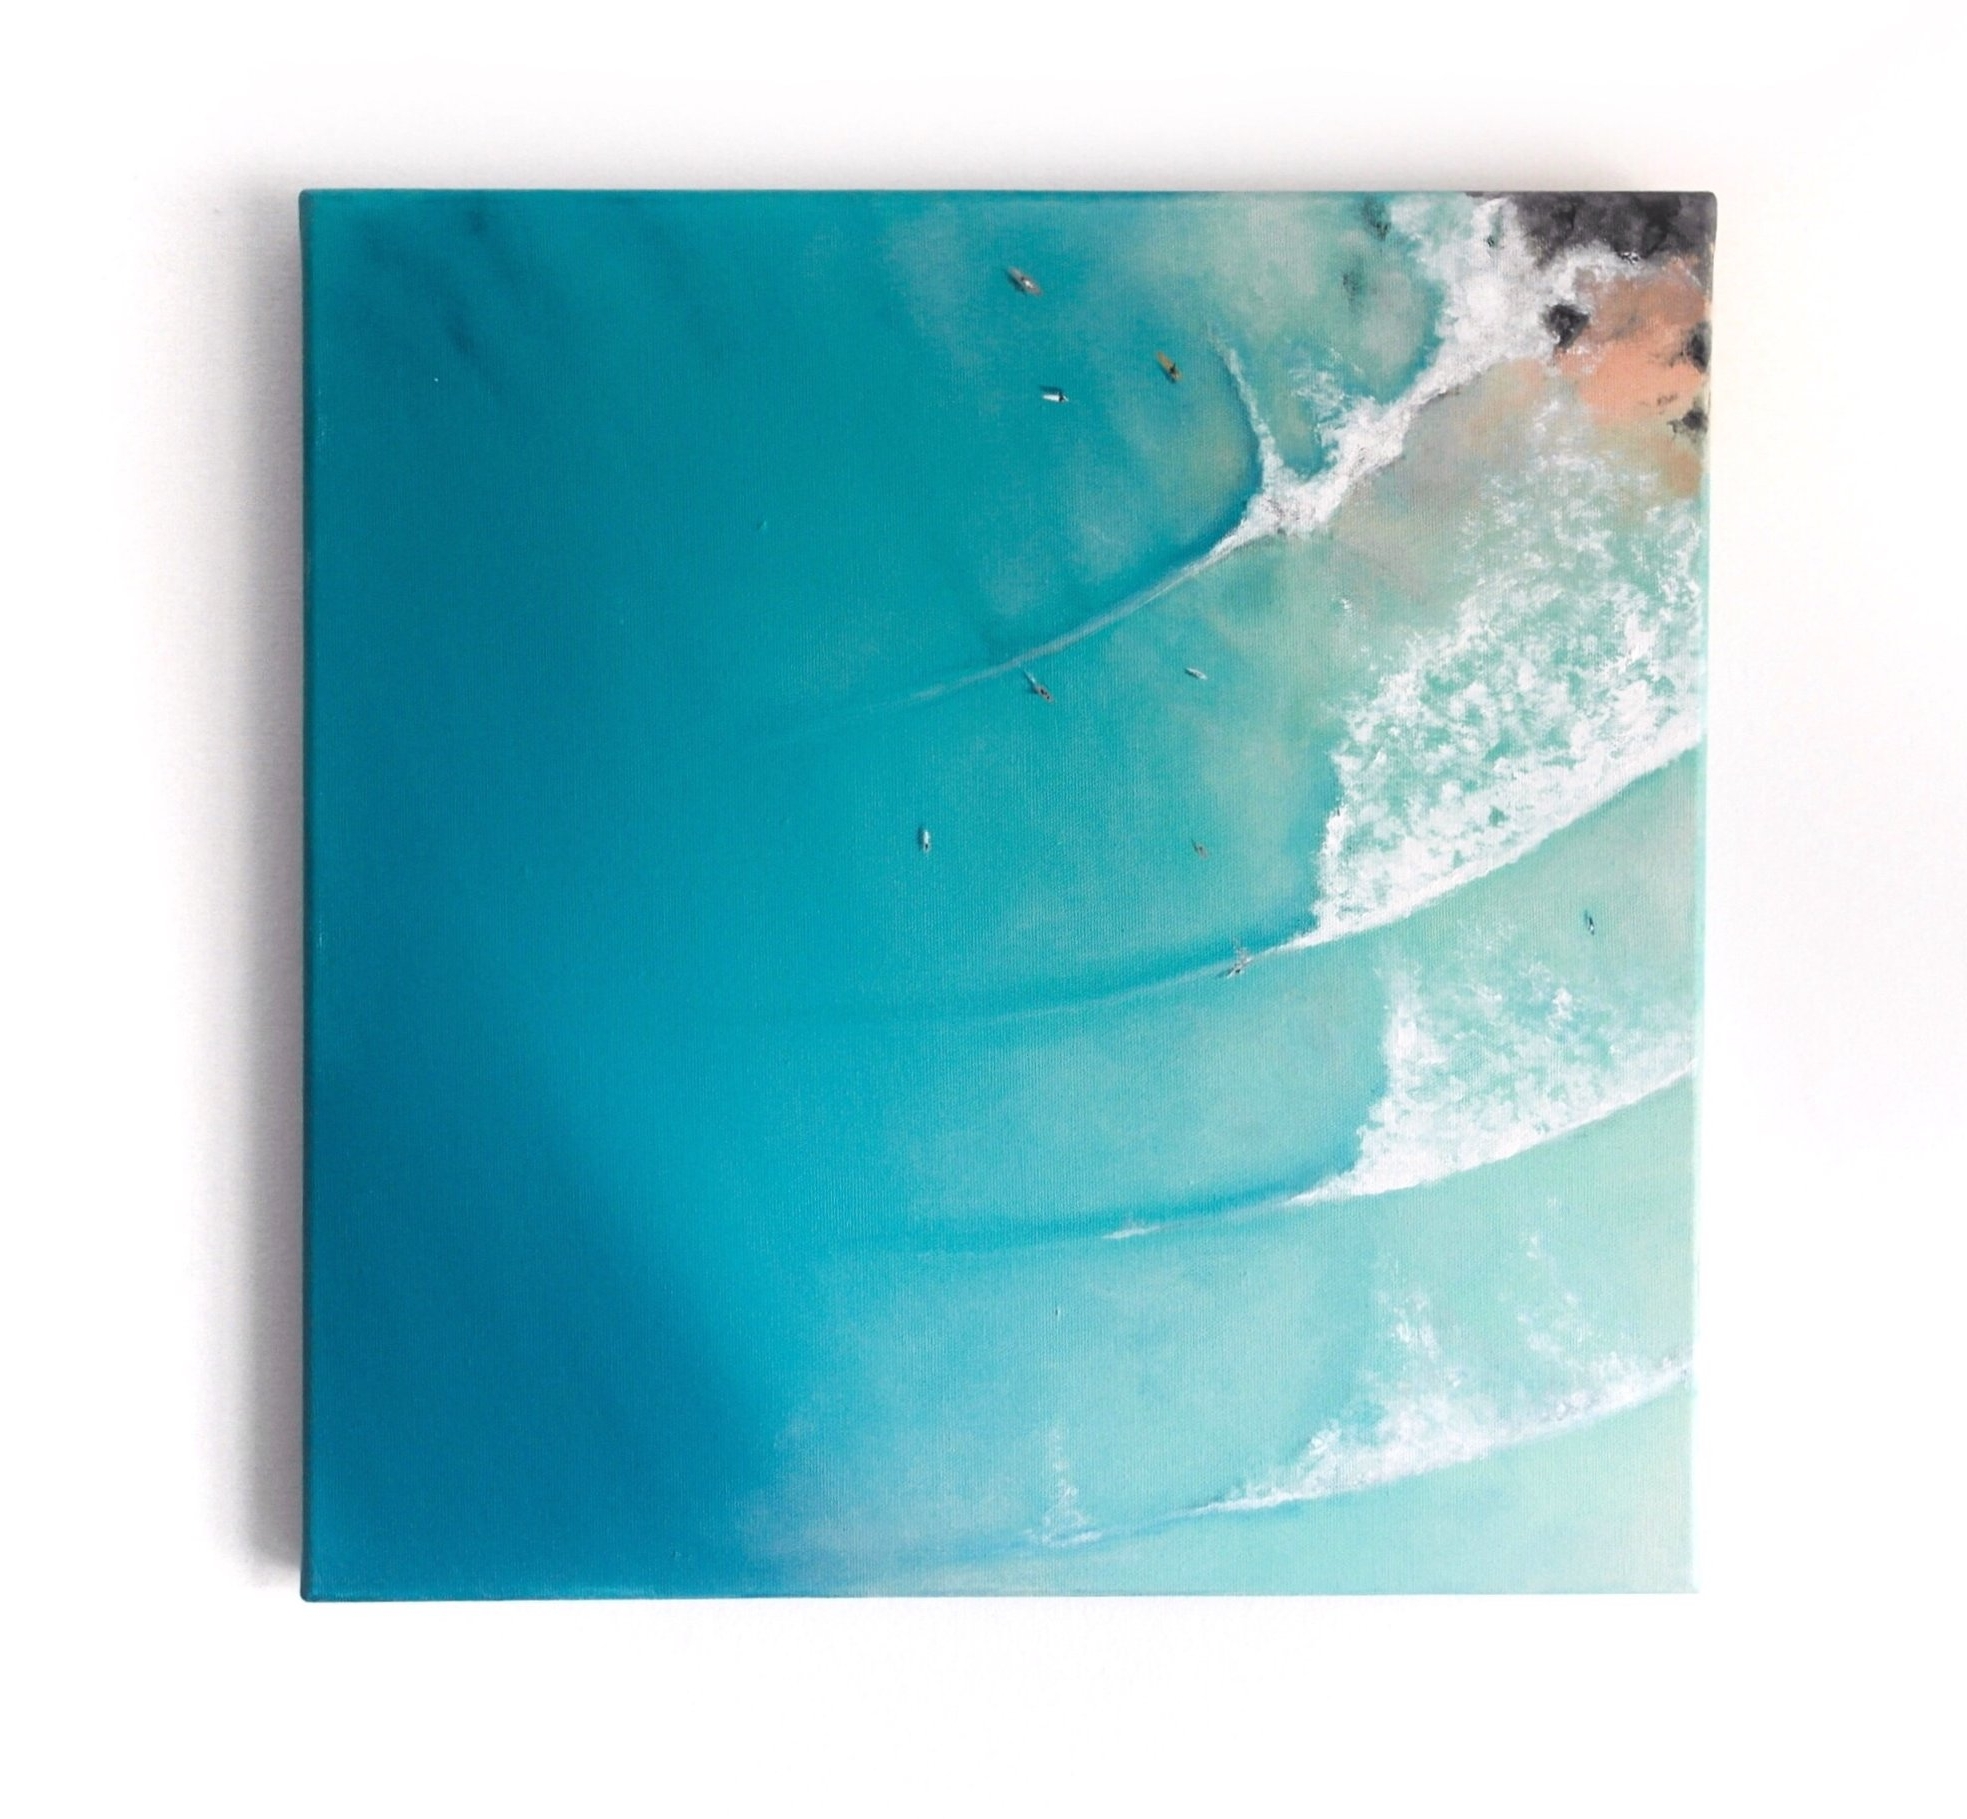 brooks_bree_surfers.jpg